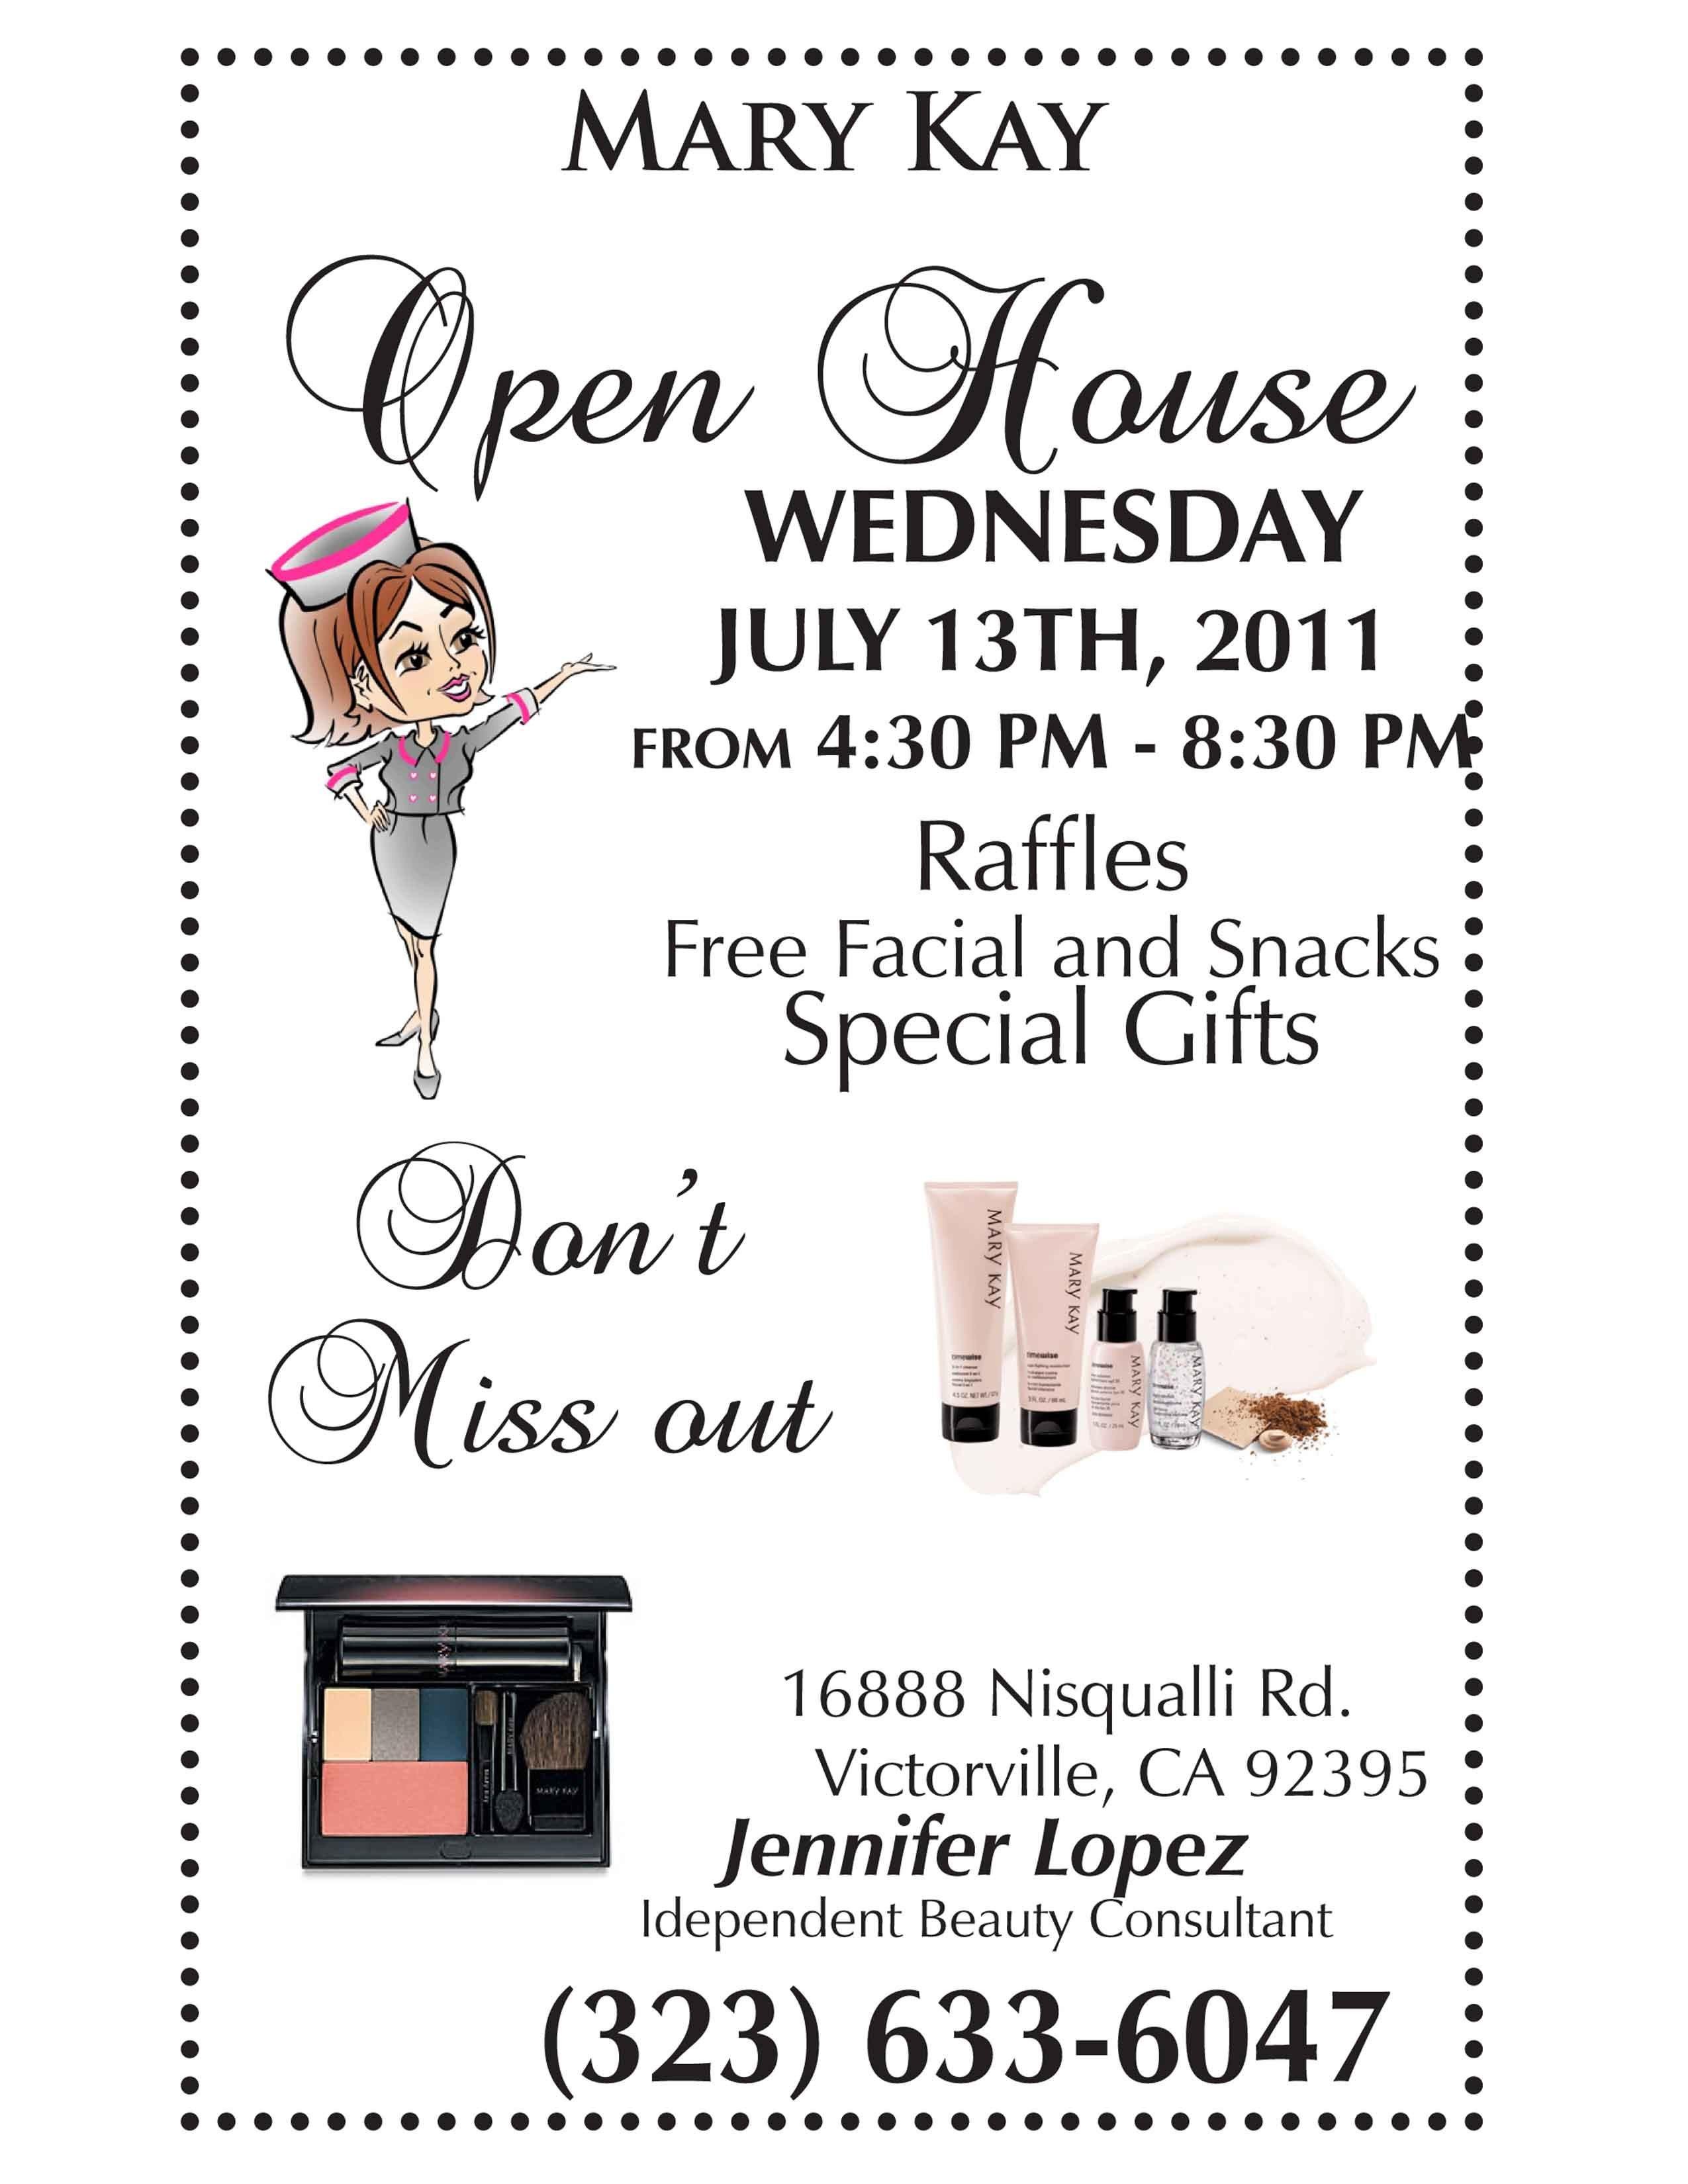 Mary Kay Invitation Templates Mary Kay Open House Flyer Template Google Search